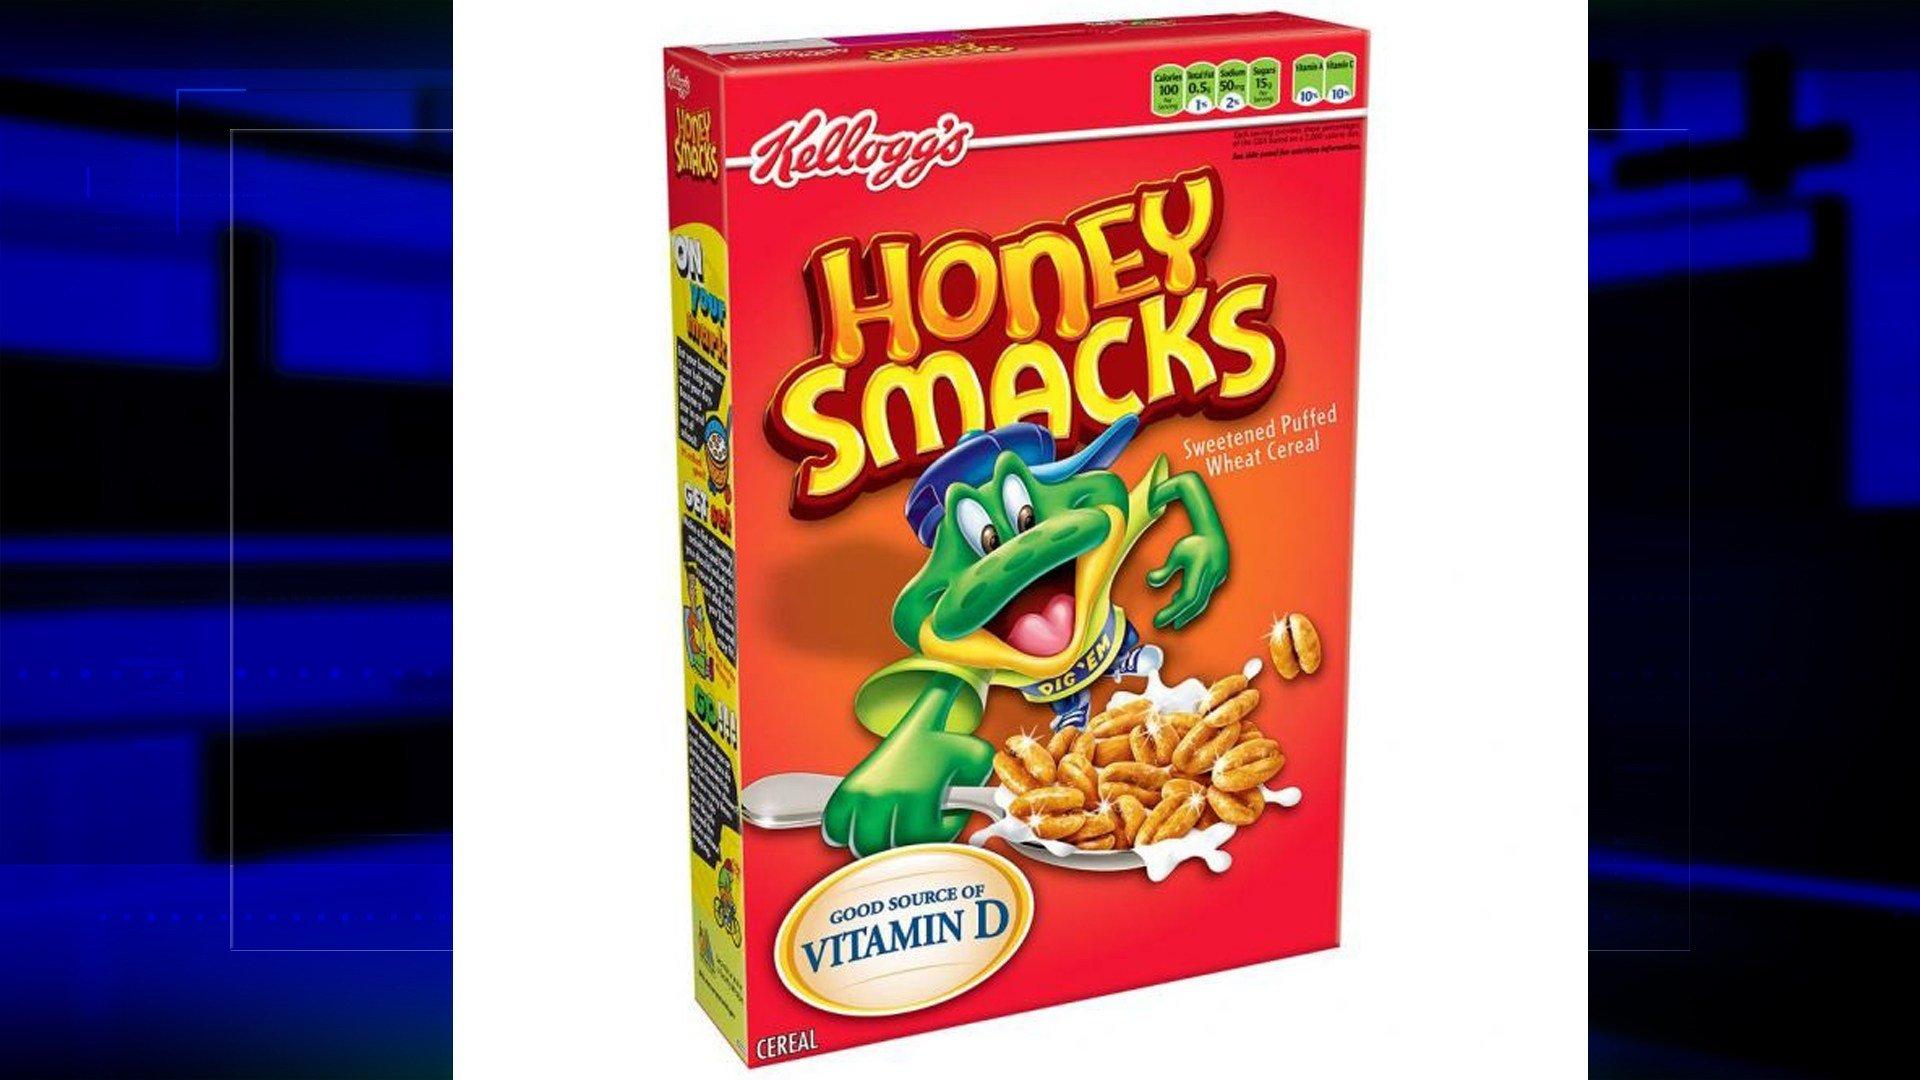 Kellogg's recalls Honeysmacks after a multi-state Salmonella outbreak